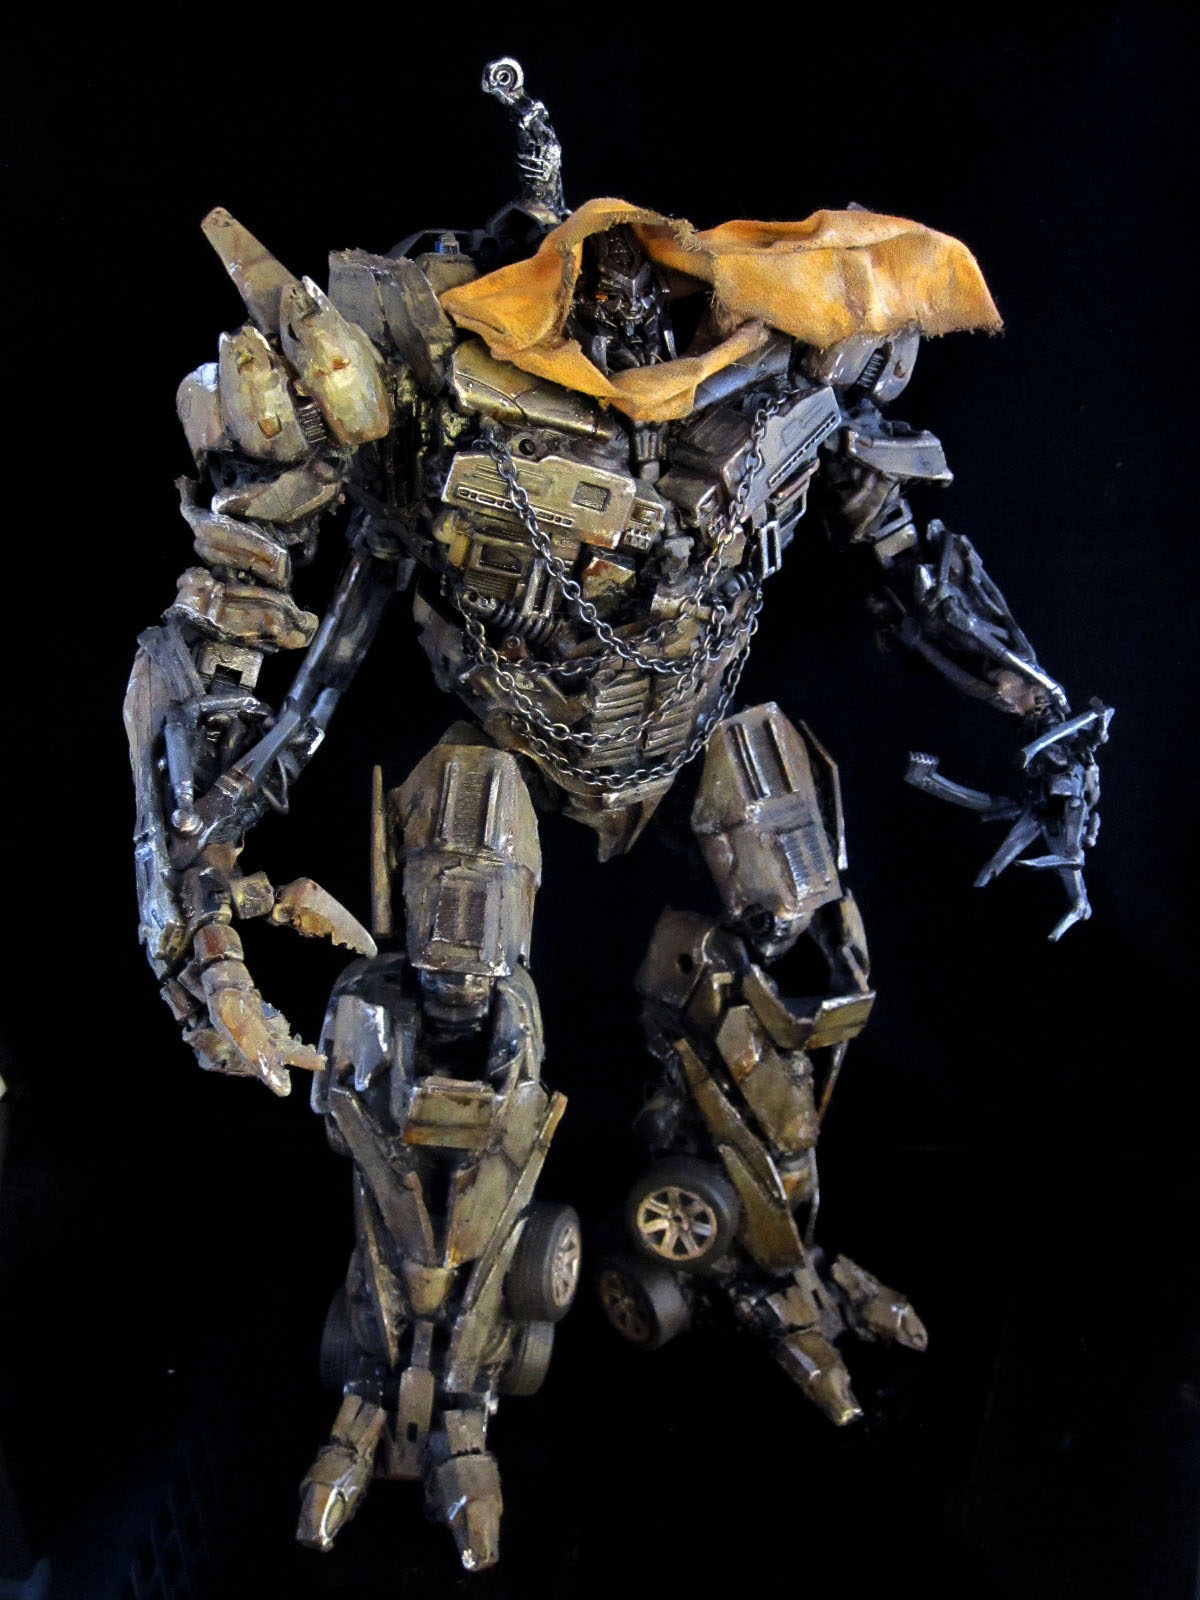 Transformers Dotm Leader Class Megatron Leader Class Rotf Megatron